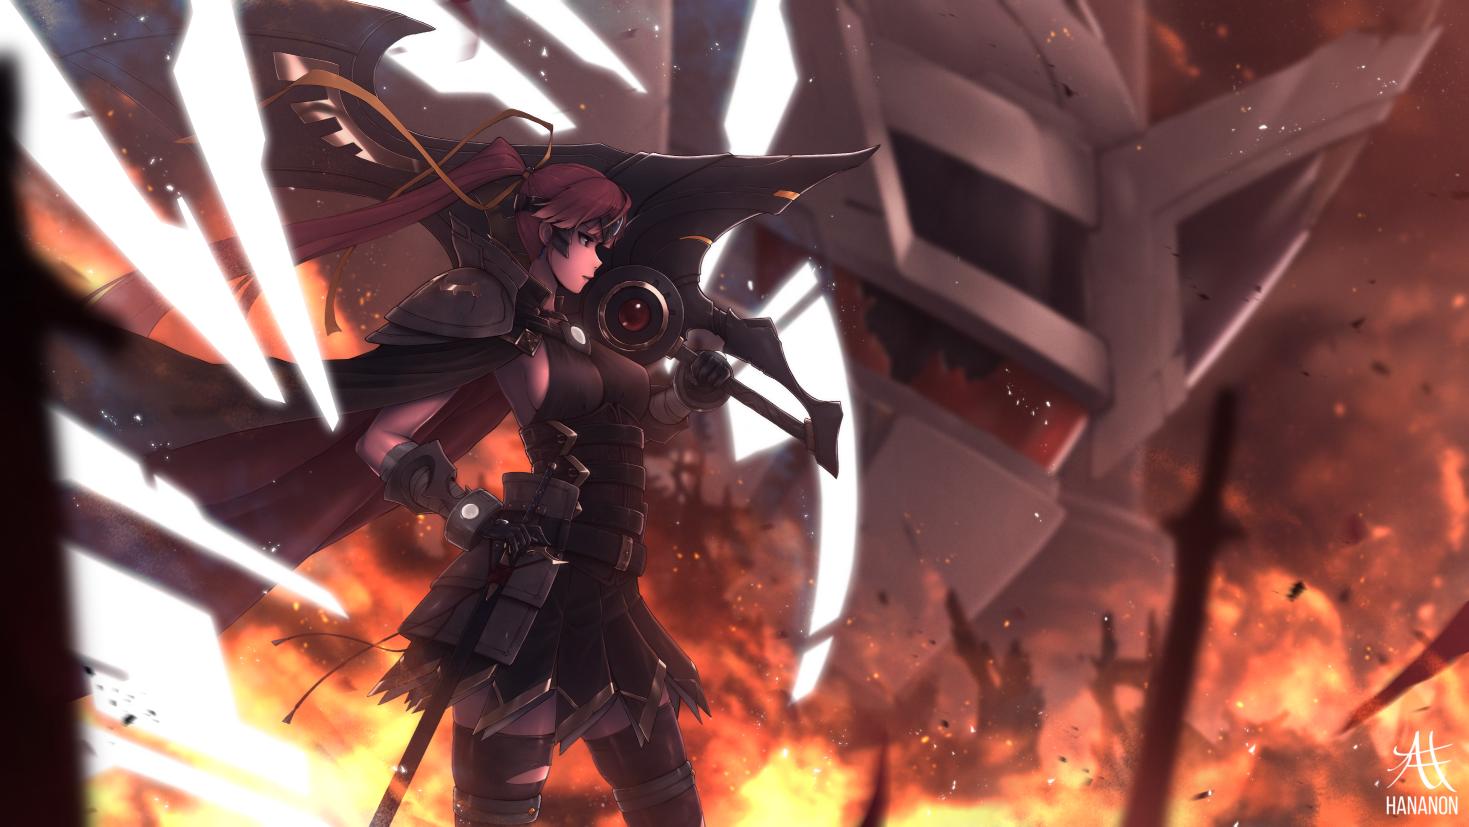 [067] Artefak Story: Enma's Origin (+Speedpaint) by Hananon